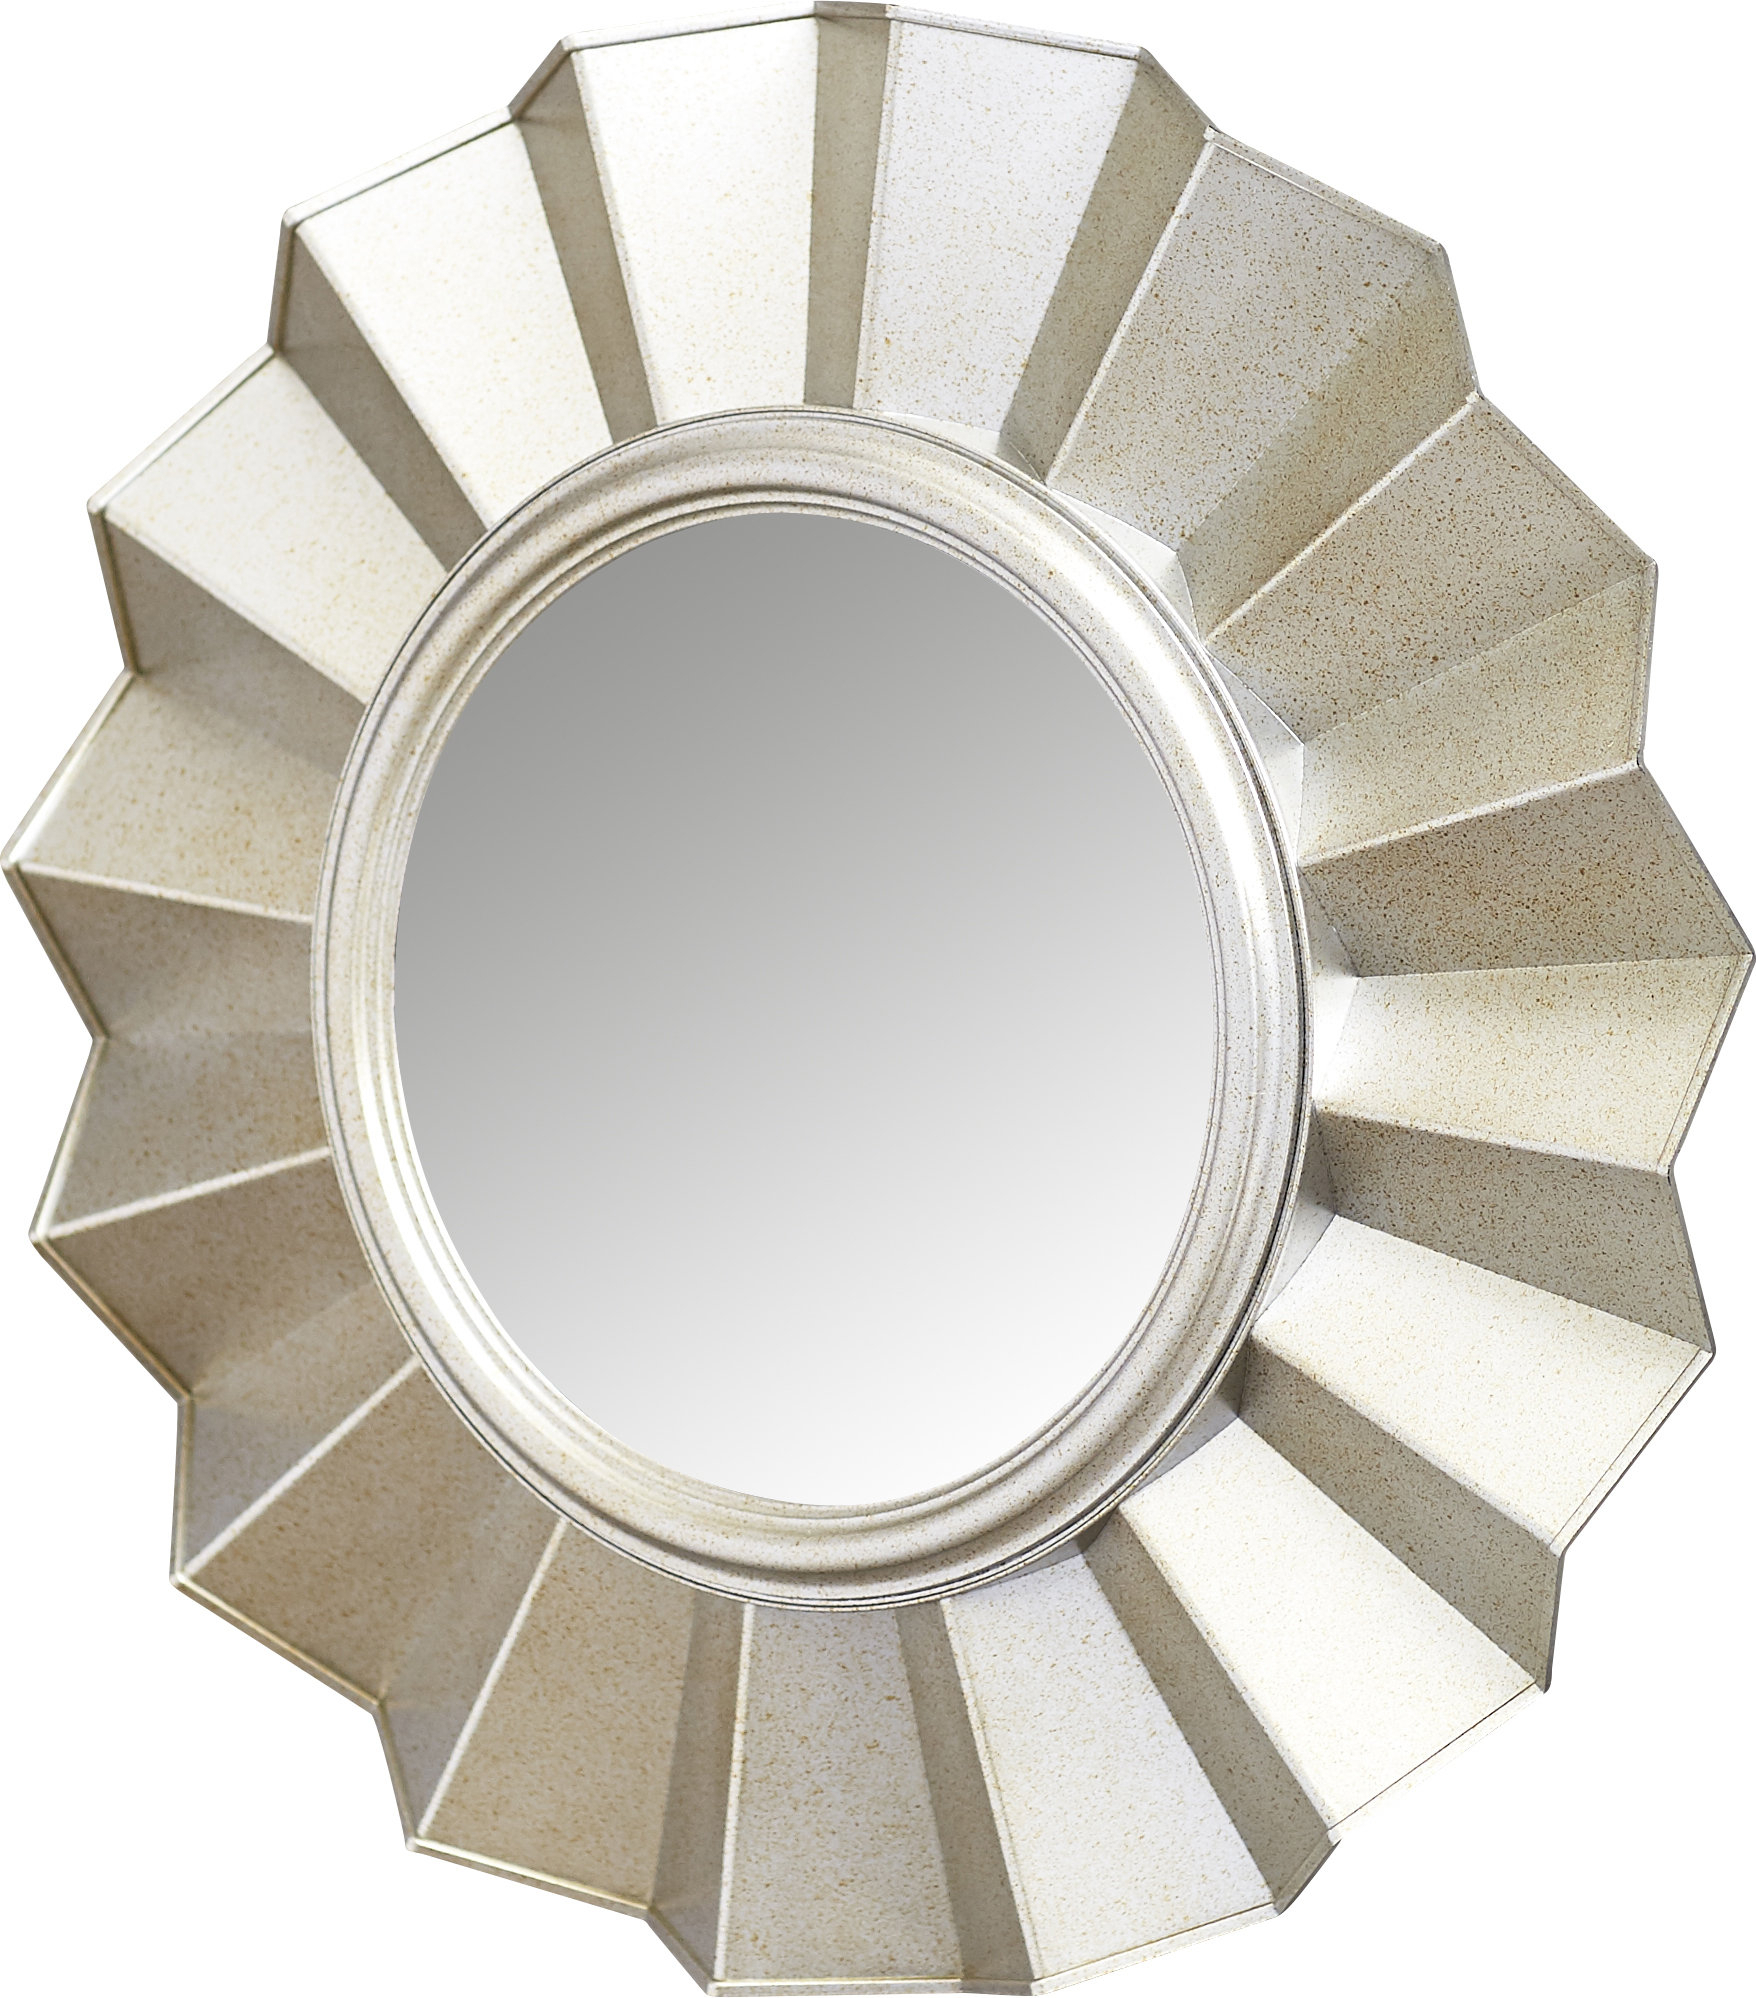 Vertical Round Wall Mirror regarding Pennsburg Rectangle Wall Mirror (Image 25 of 30)